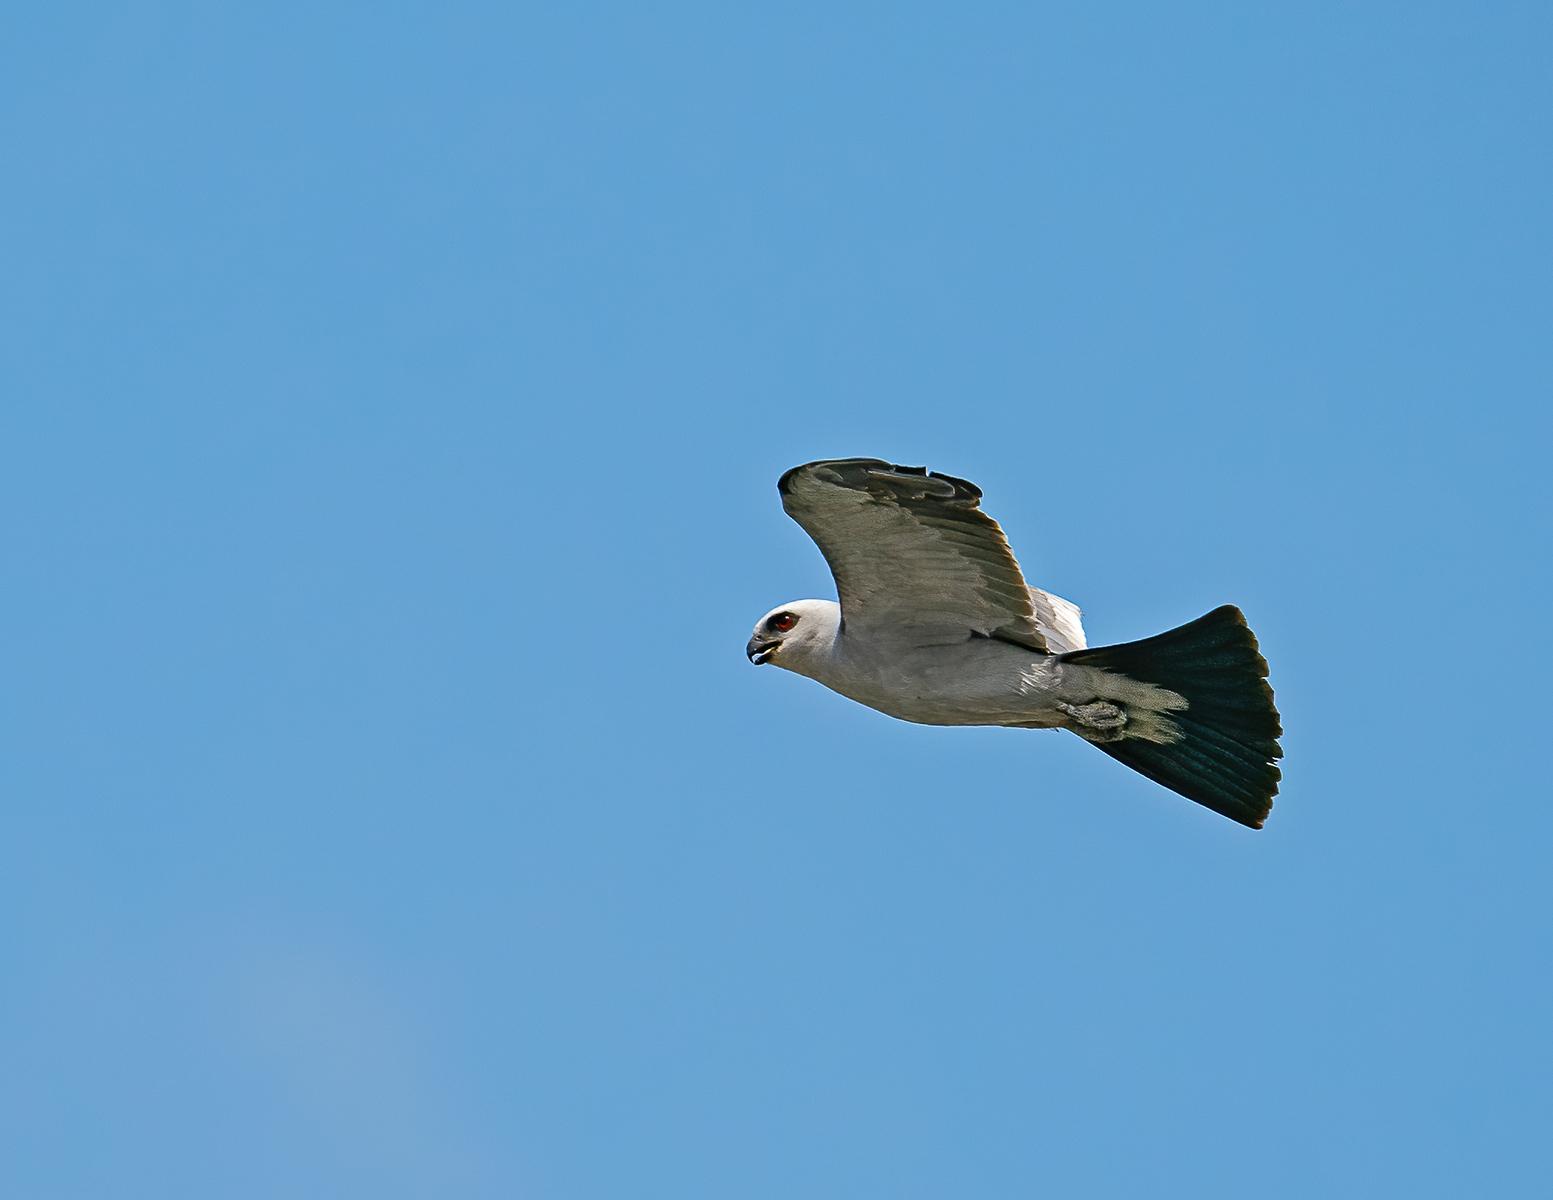 IMAGE: https://photos.smugmug.com/Beautyinthetreesandintheair/Birds-in-2021/Mississippi-kites/i-XxQ5s3c/0/ccd2ea72/X3/Ms%20Kite_9_8-4-21-94-X3.jpg